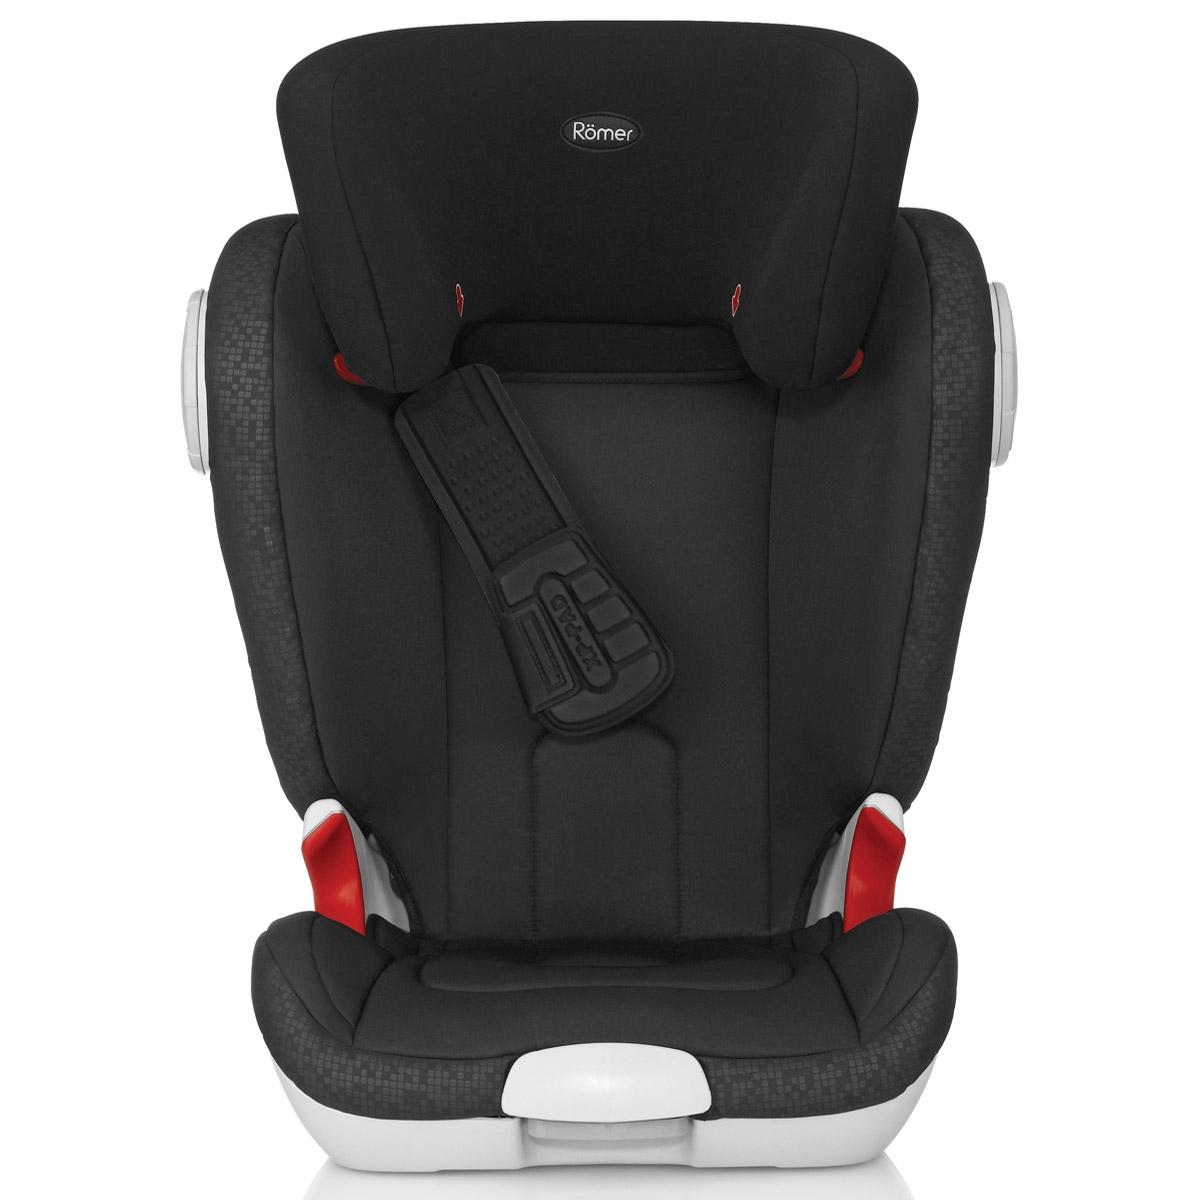 britax r mer auto kindersitz kidfix xp sict design 2015 farbe w hlbar ebay. Black Bedroom Furniture Sets. Home Design Ideas